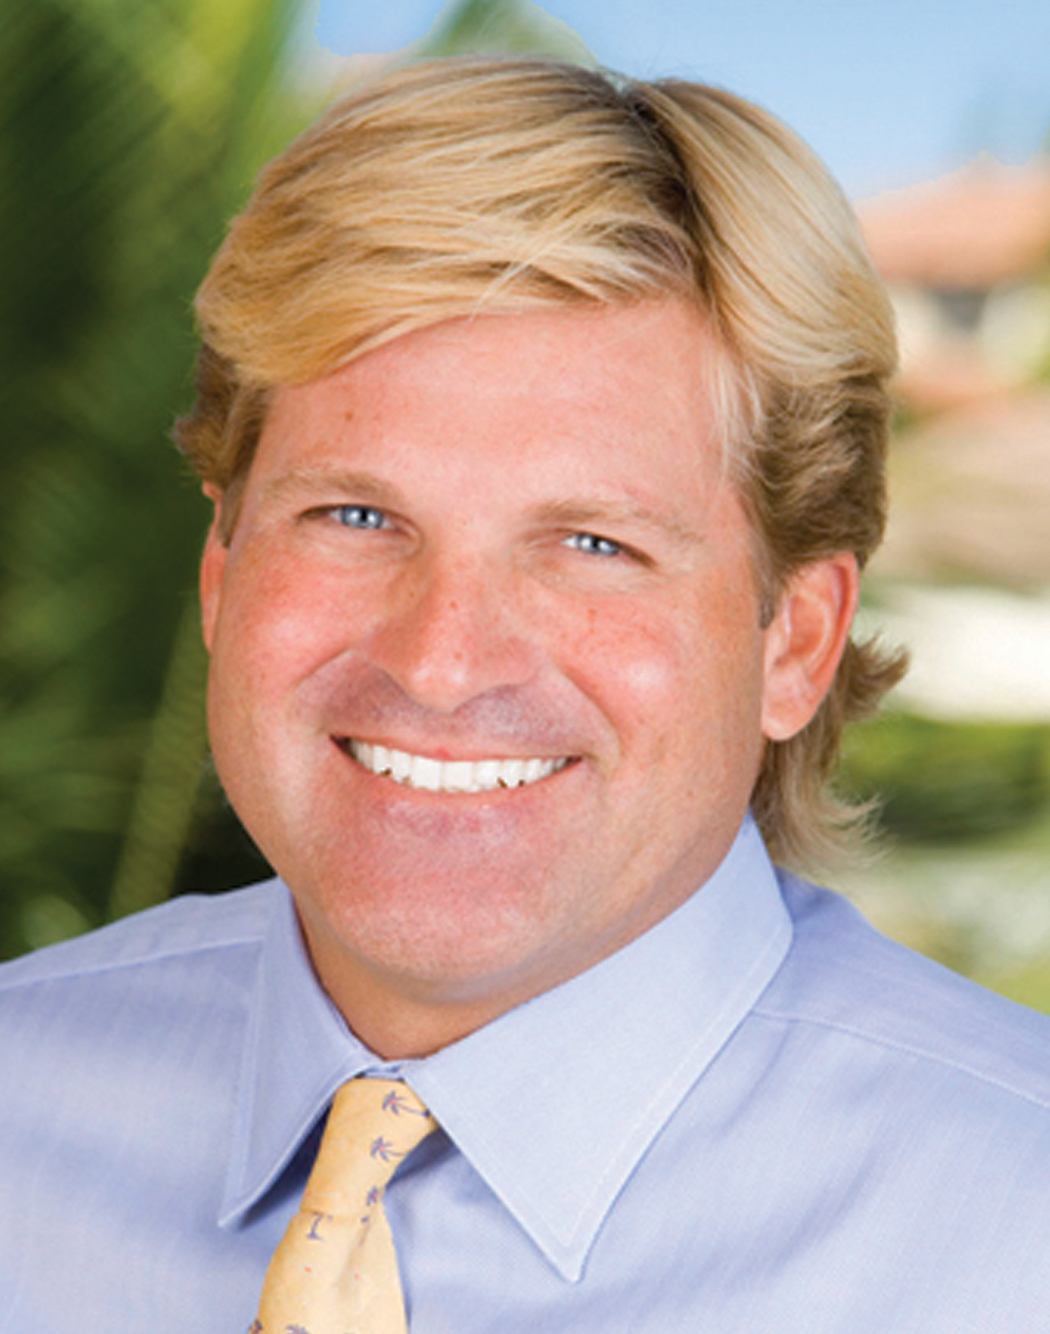 Michael Lawler